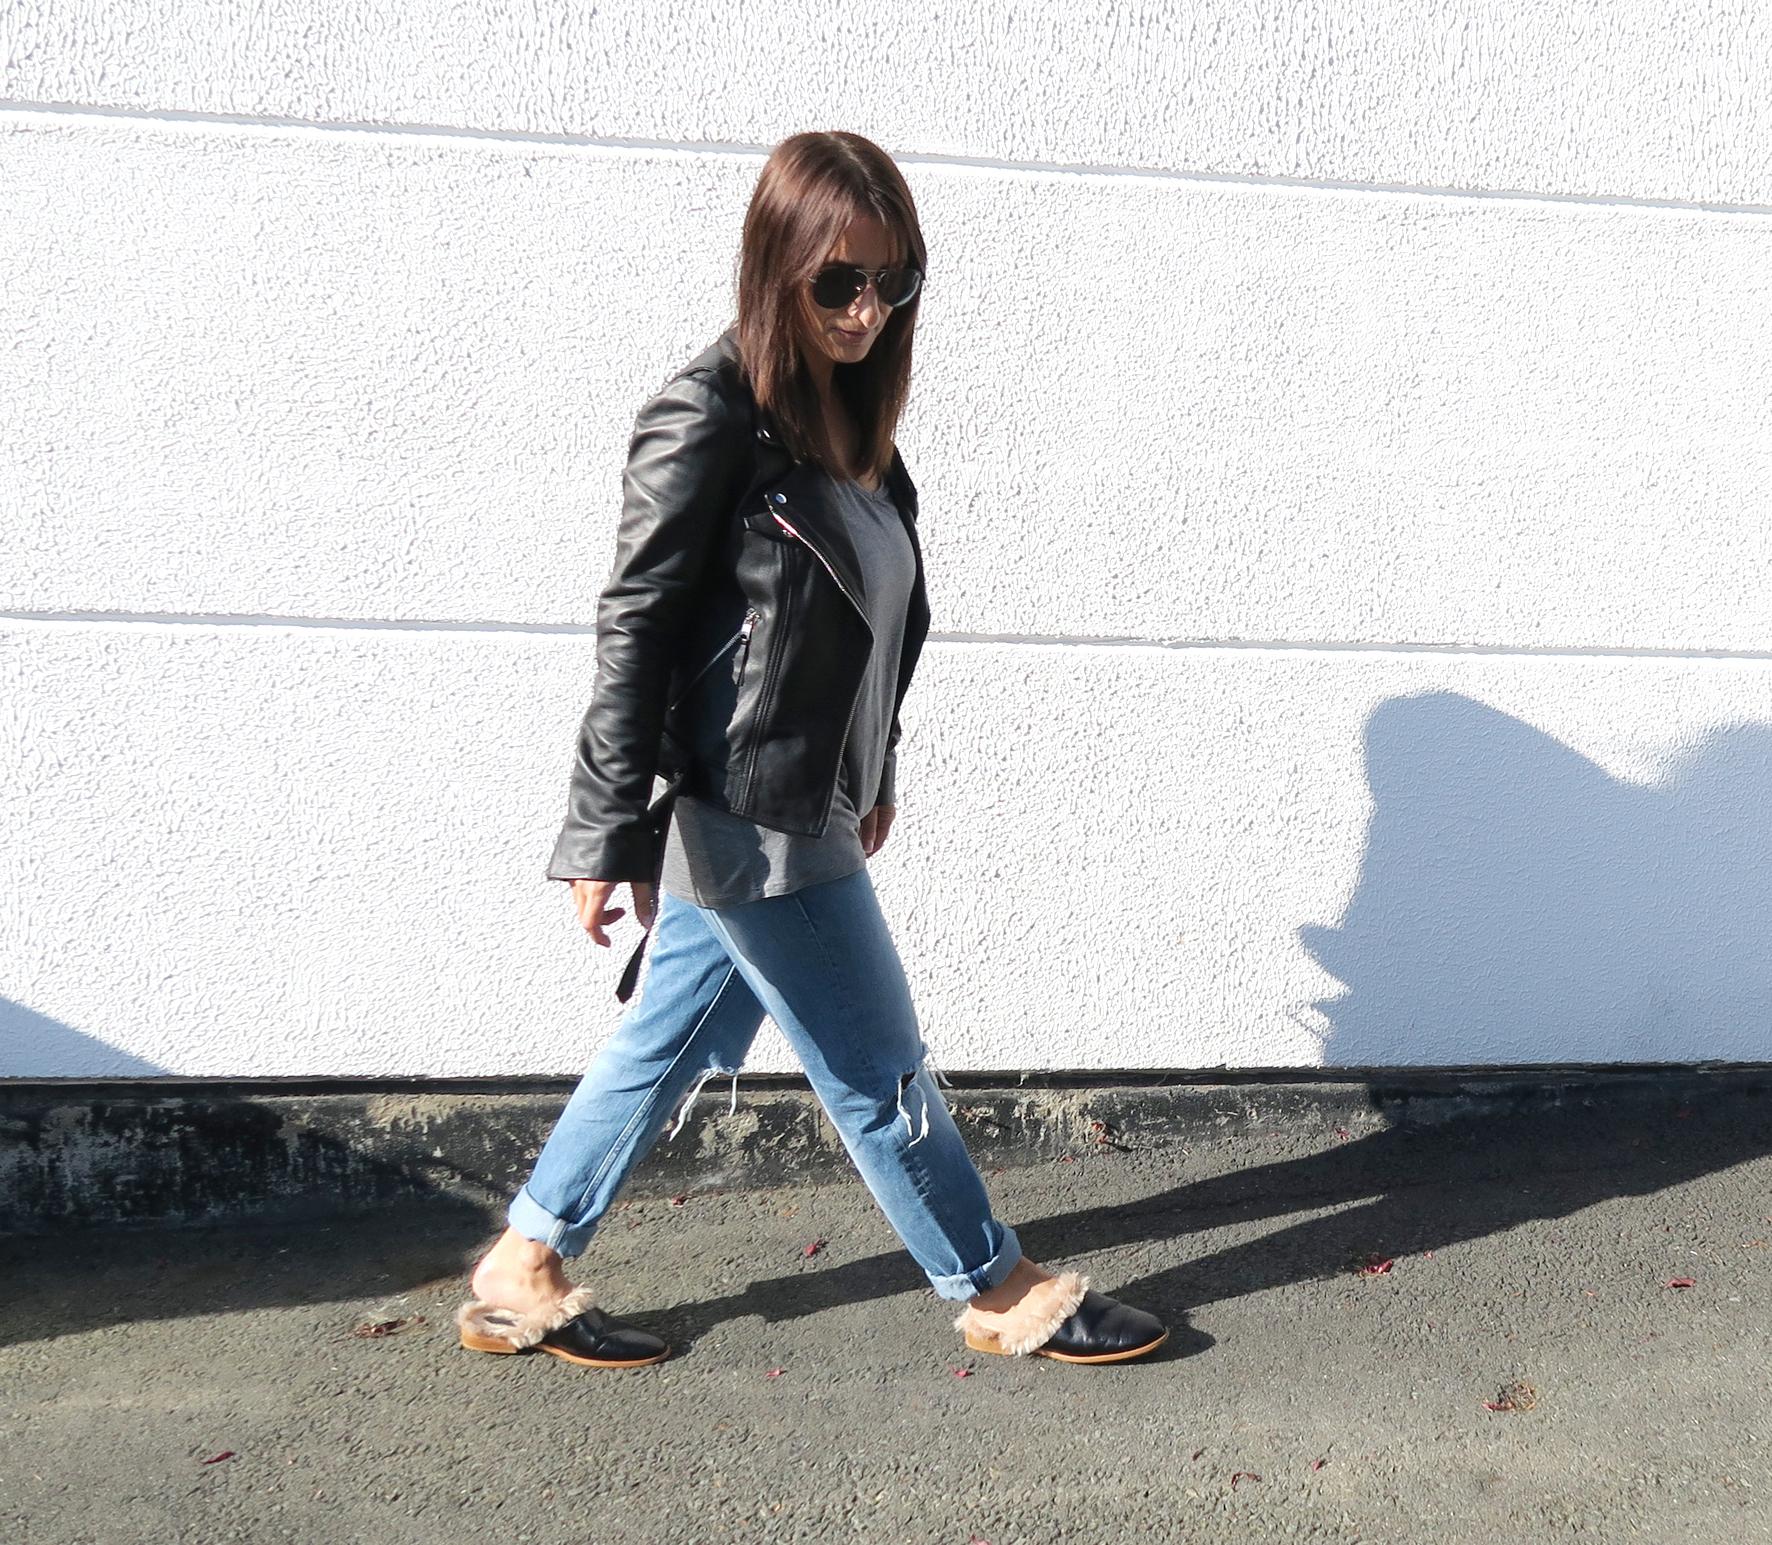 gucci-lookalike-flat-shoes-blogger-bloggerstyle-modesalat-3